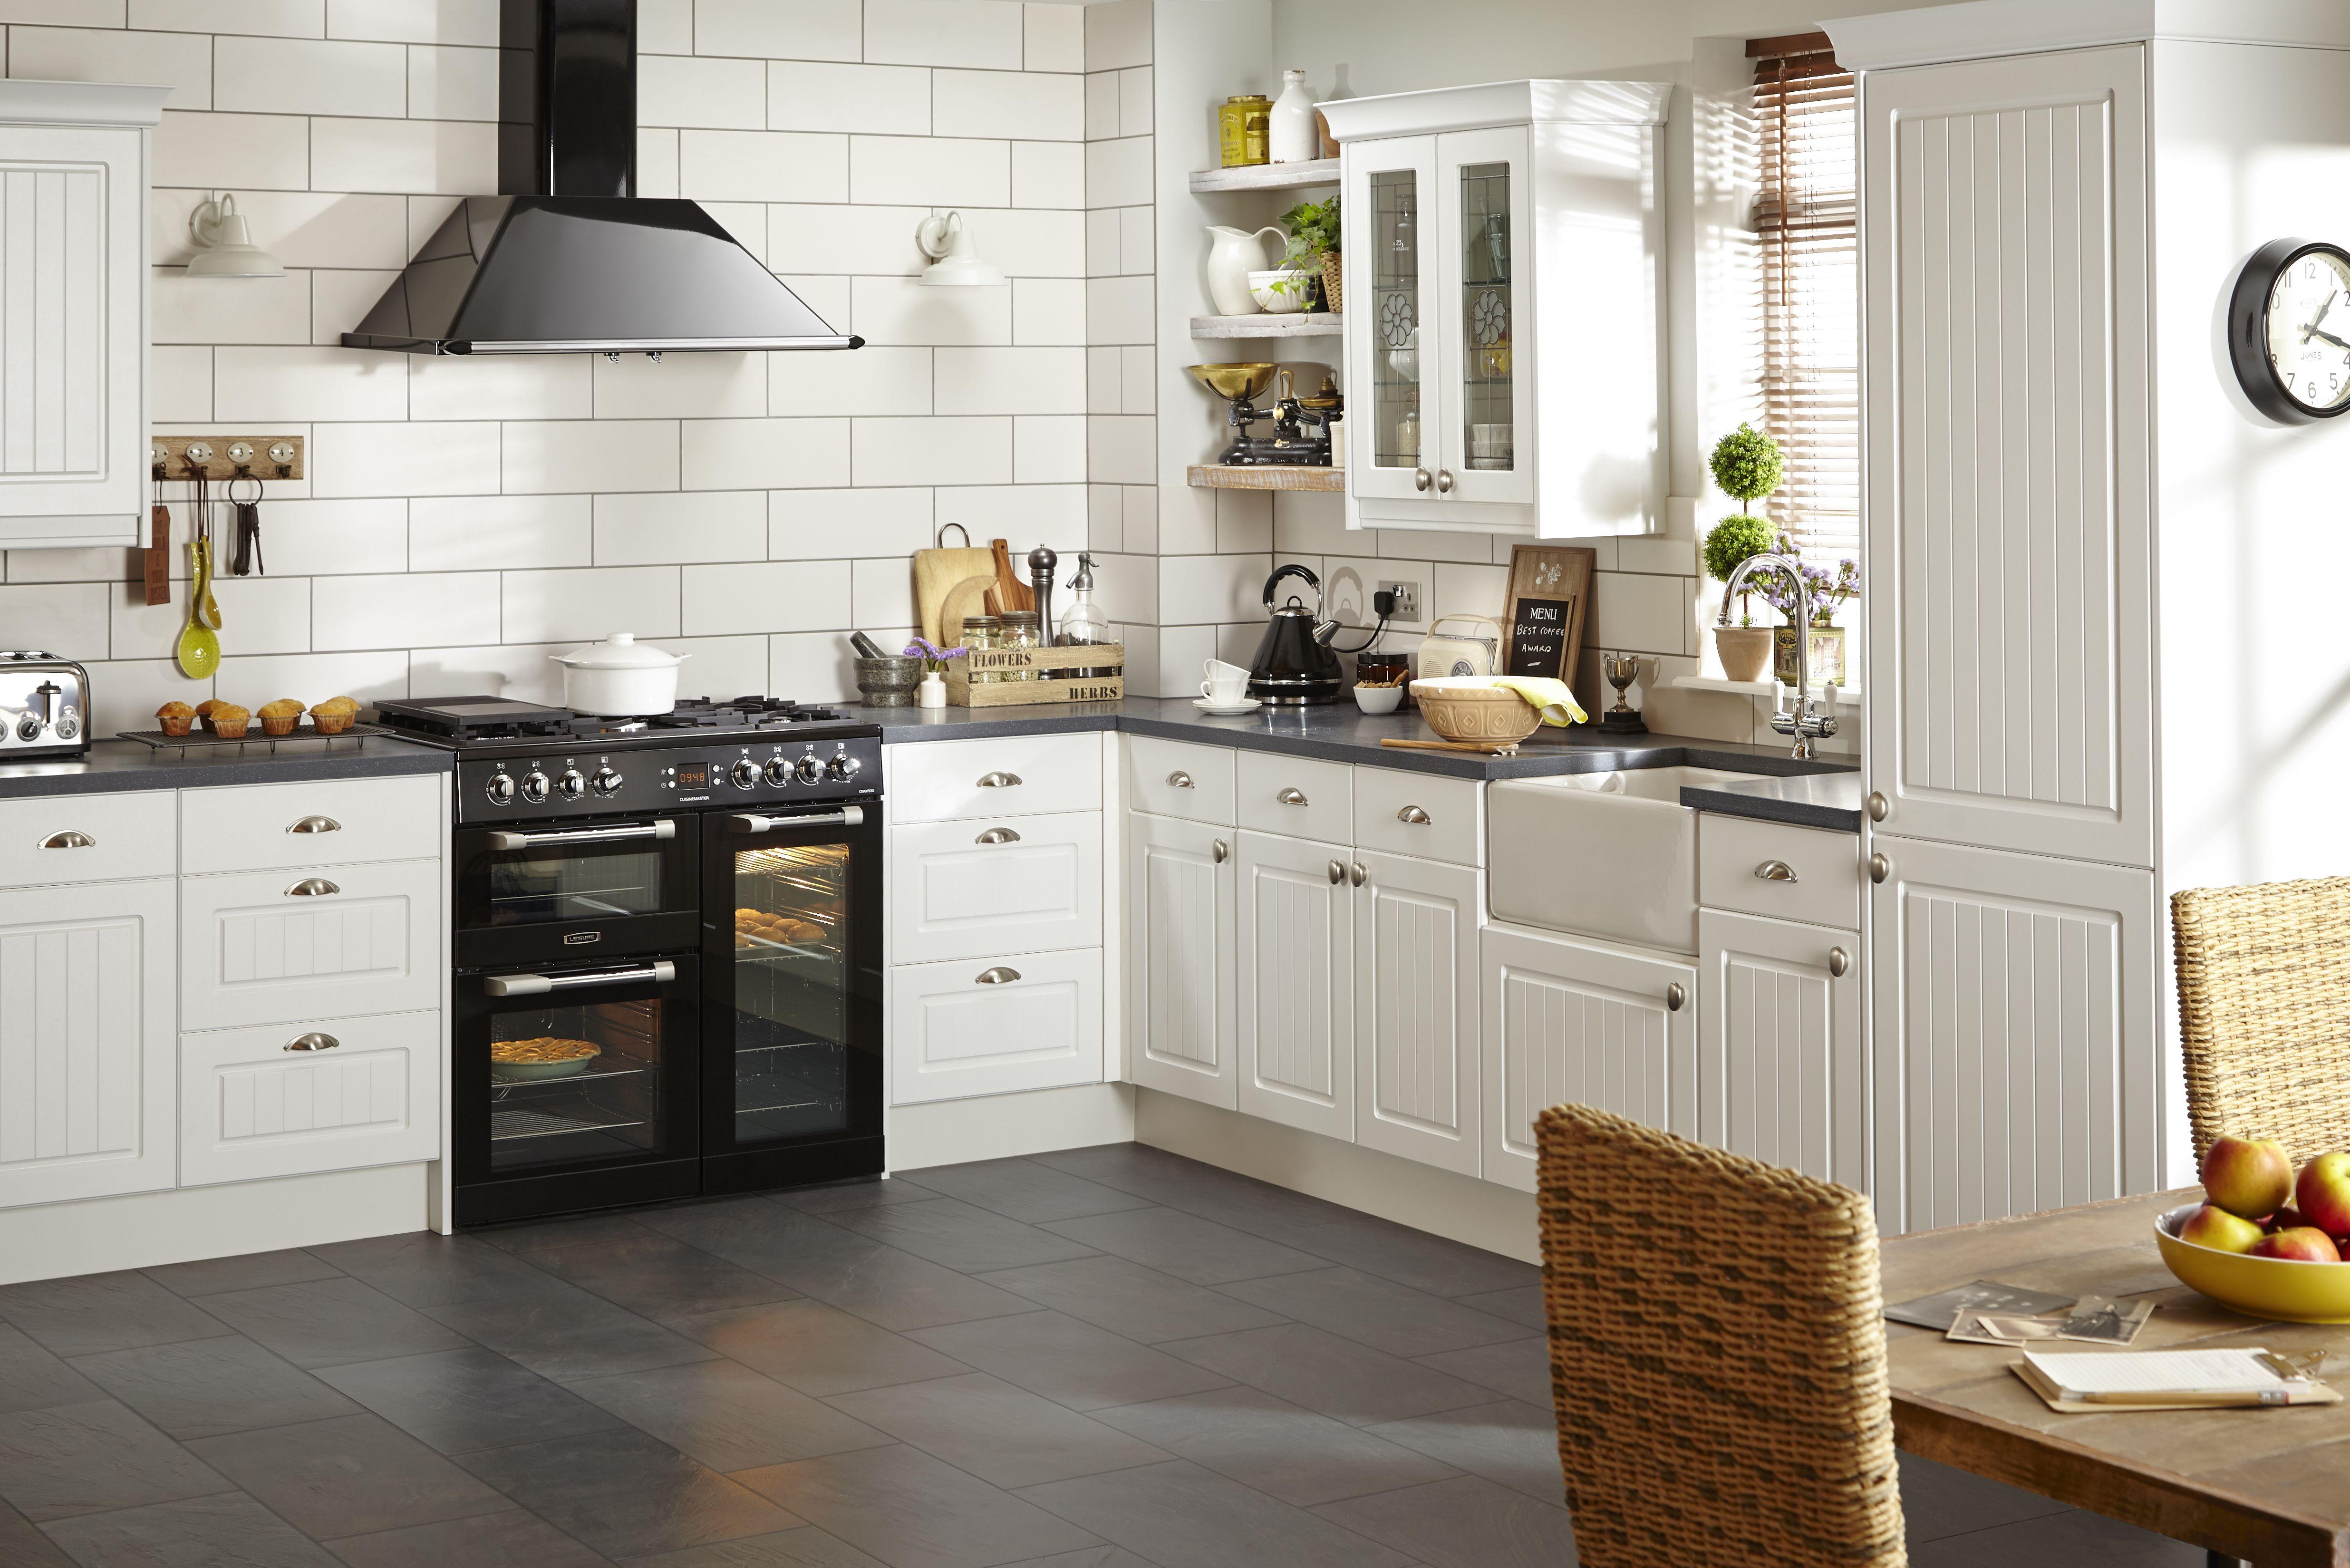 B And Q Kitchens - Restaurant Interior Design Drawing •